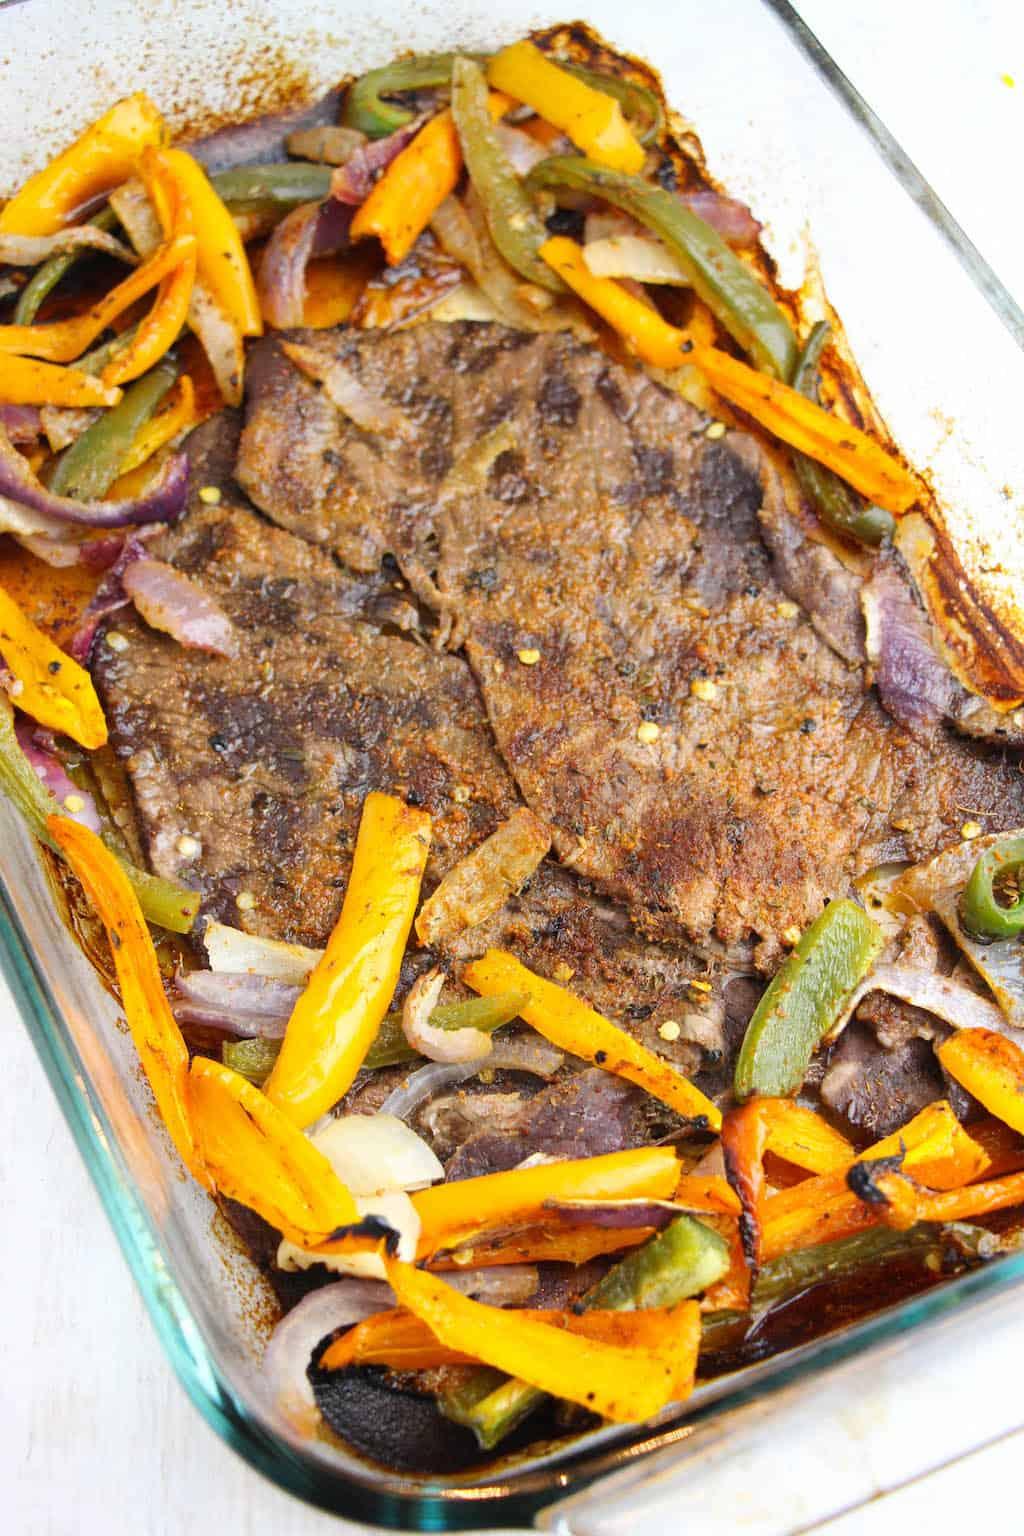 rachael ray sheet pan steak fajitas